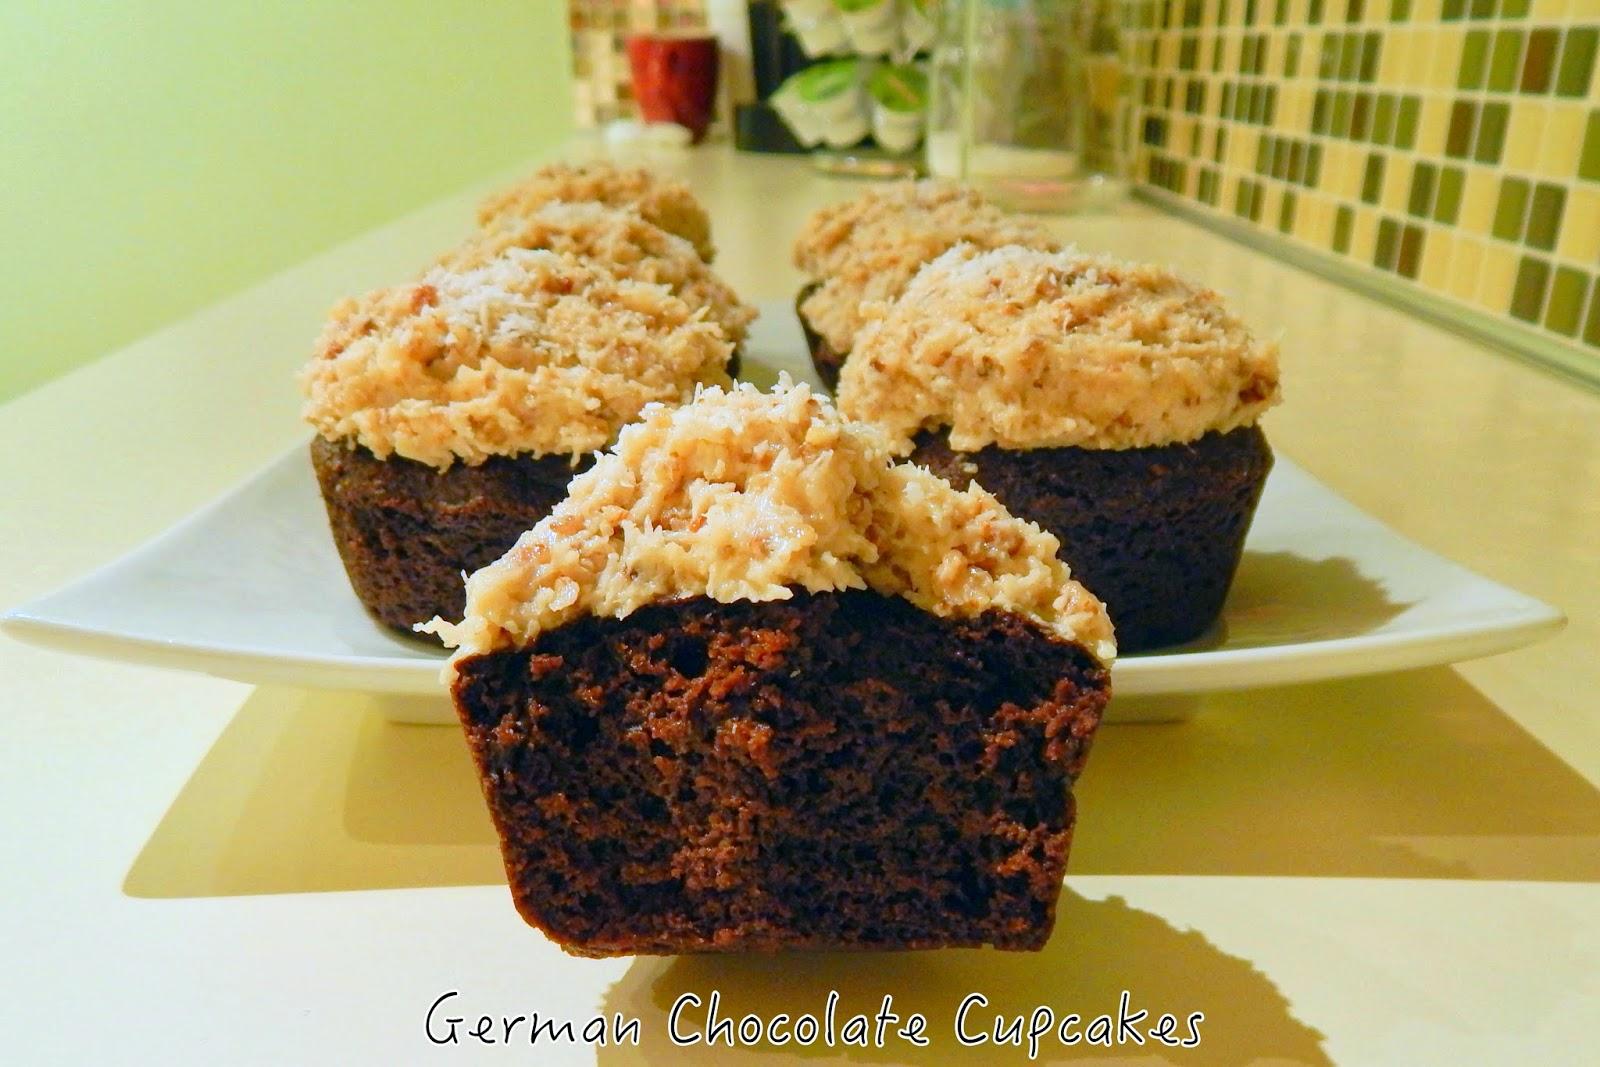 German Chocolate Cupcakes | Cut The Wheat